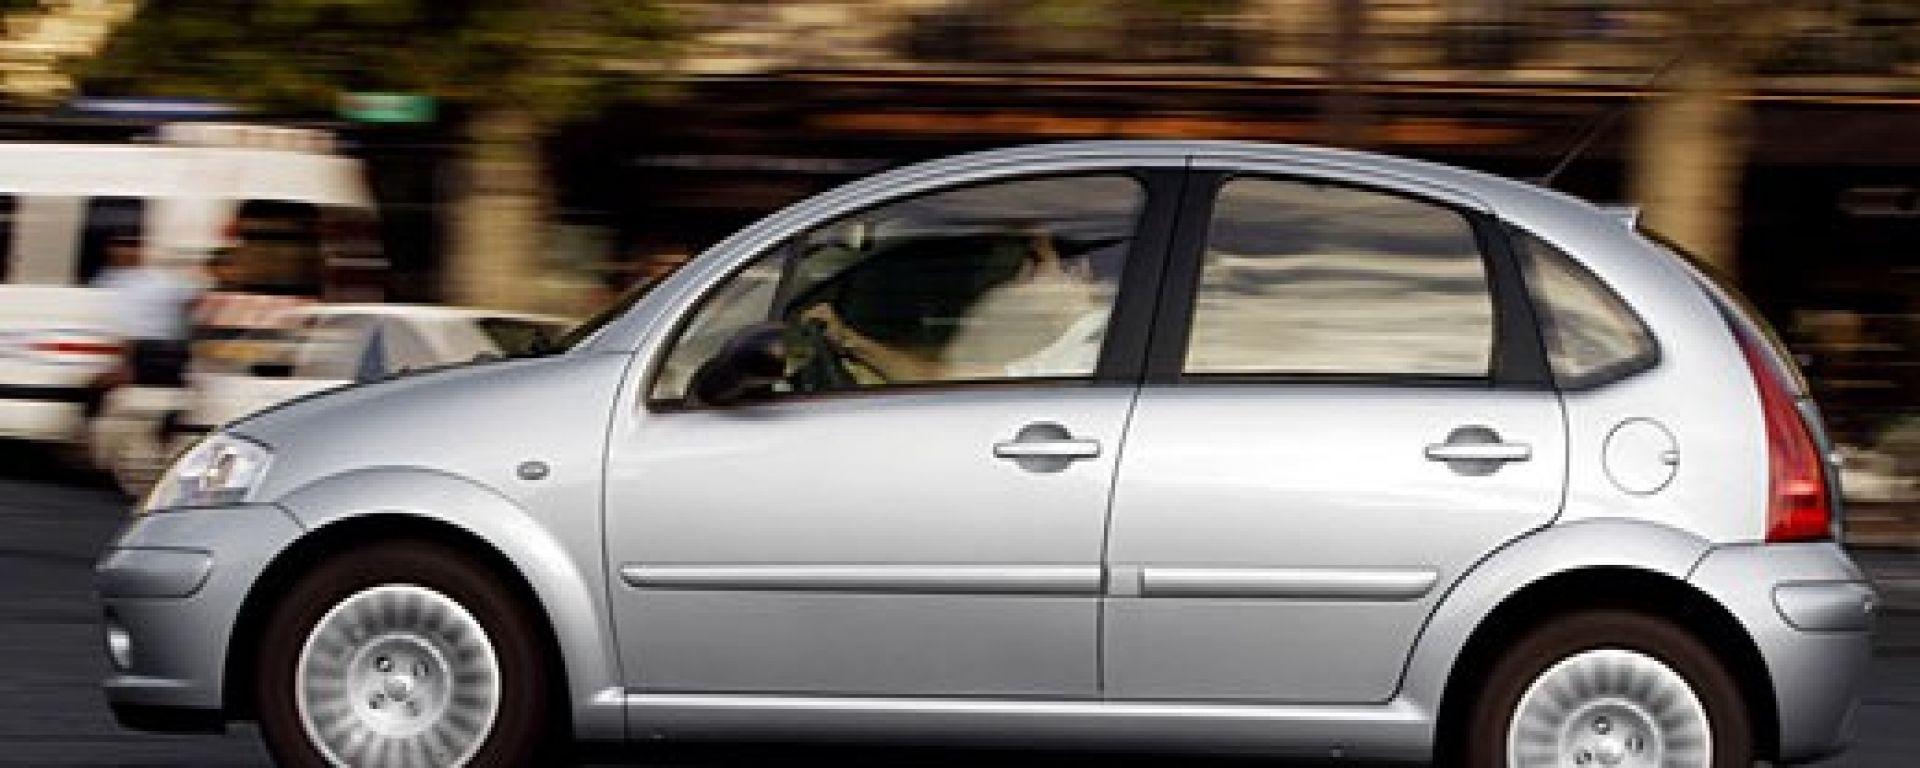 Citroën C3 Stop&Start